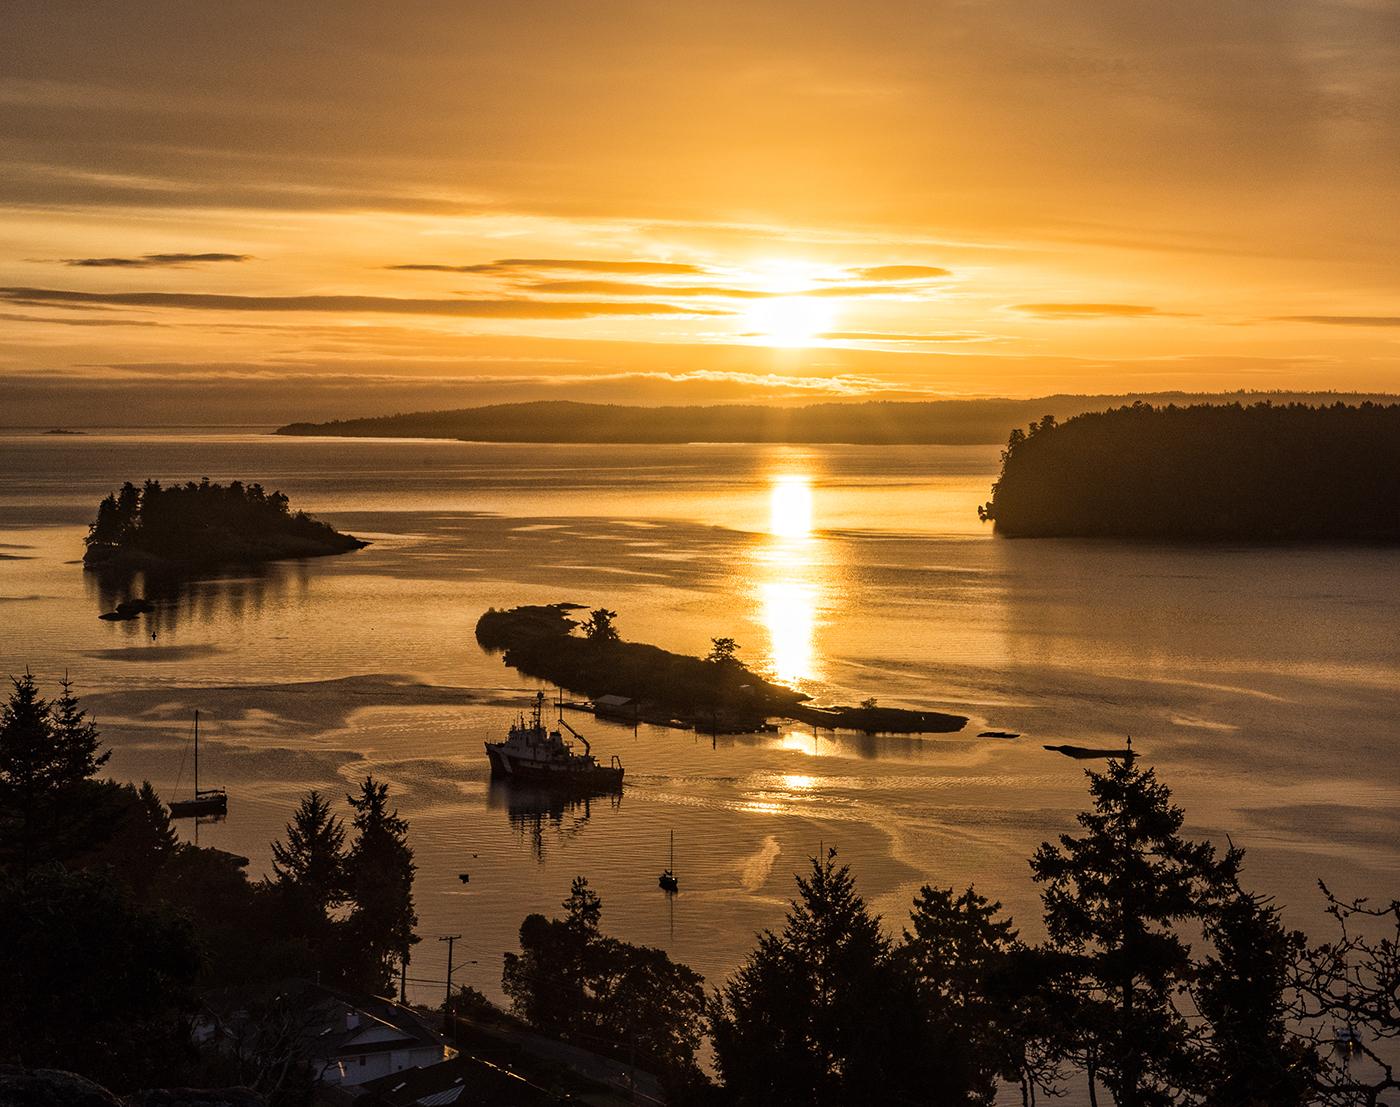 The Canadian Coast Guard ship W.E. Ricker comes into Departure Bay at sunrise